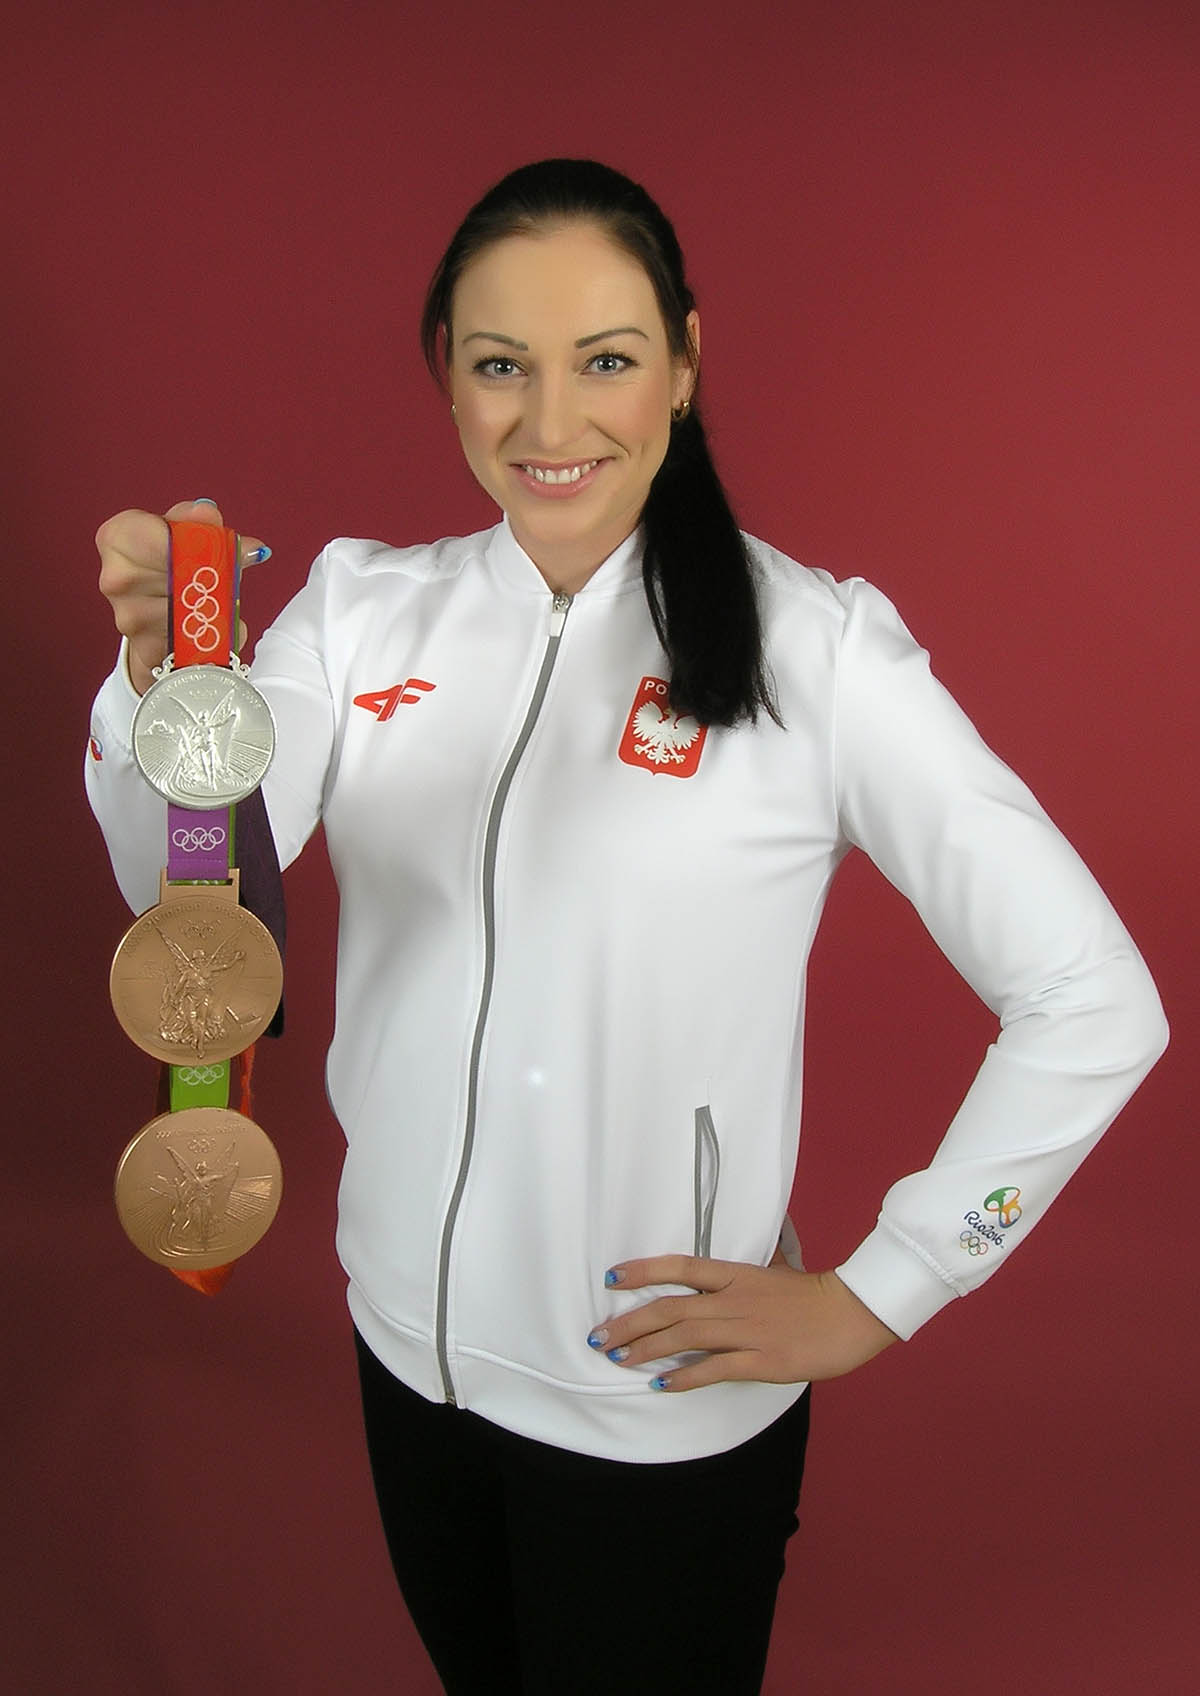 Beata Rosolska (Mikołajczyk)